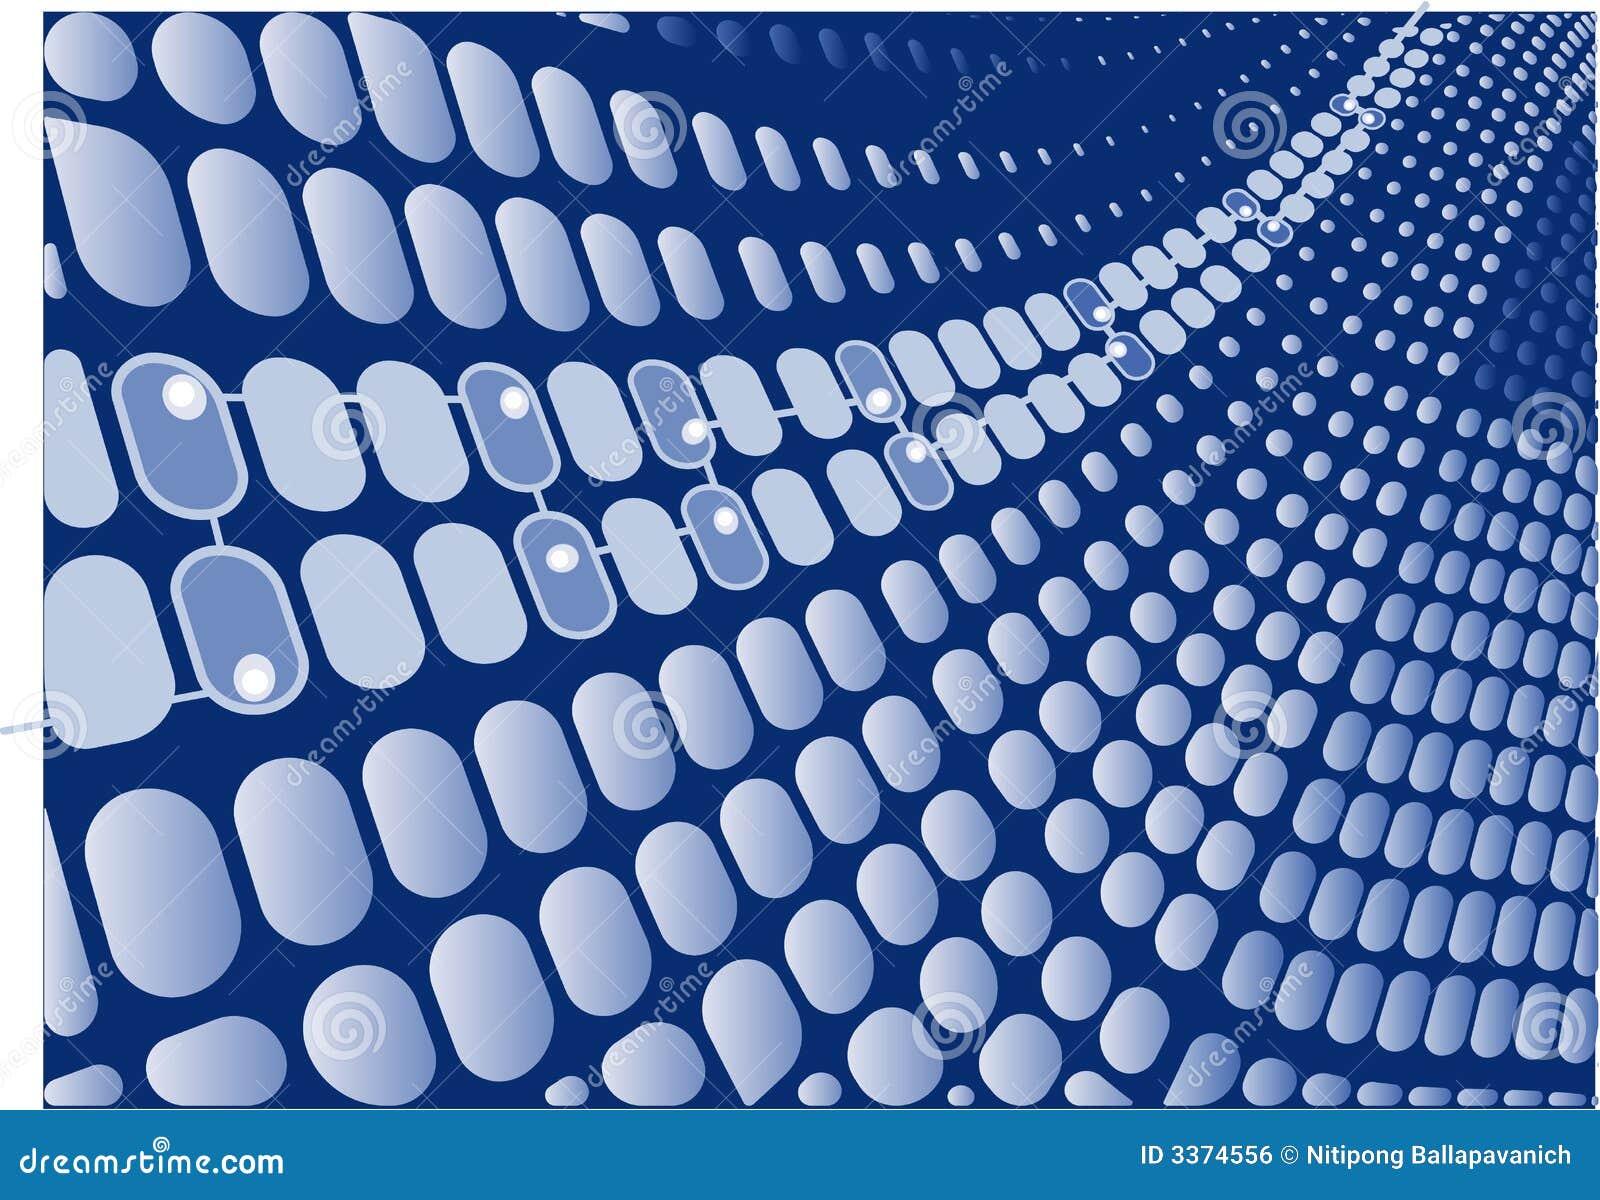 Digital Blue Wave Retro Vector Royalty Free Stock Image - Image ...